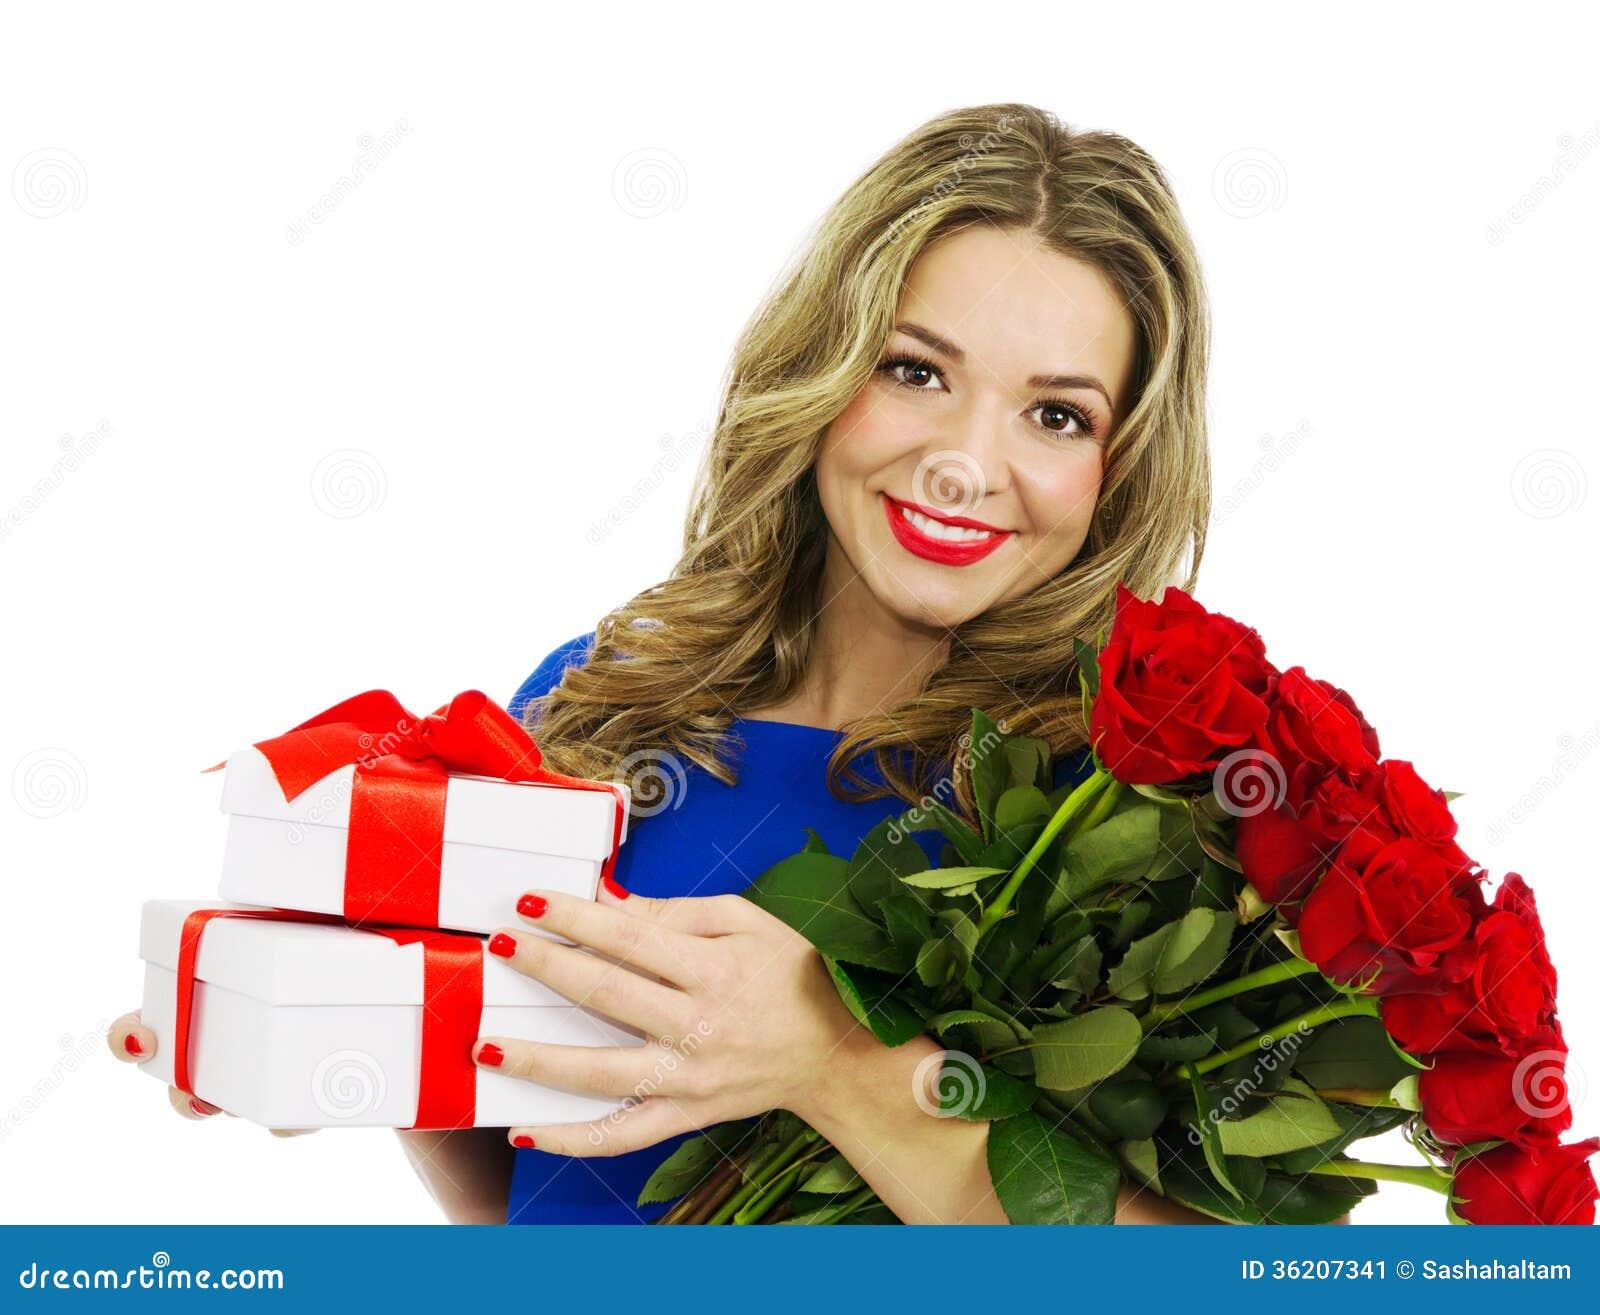 mujer y rosa roja - photo #12